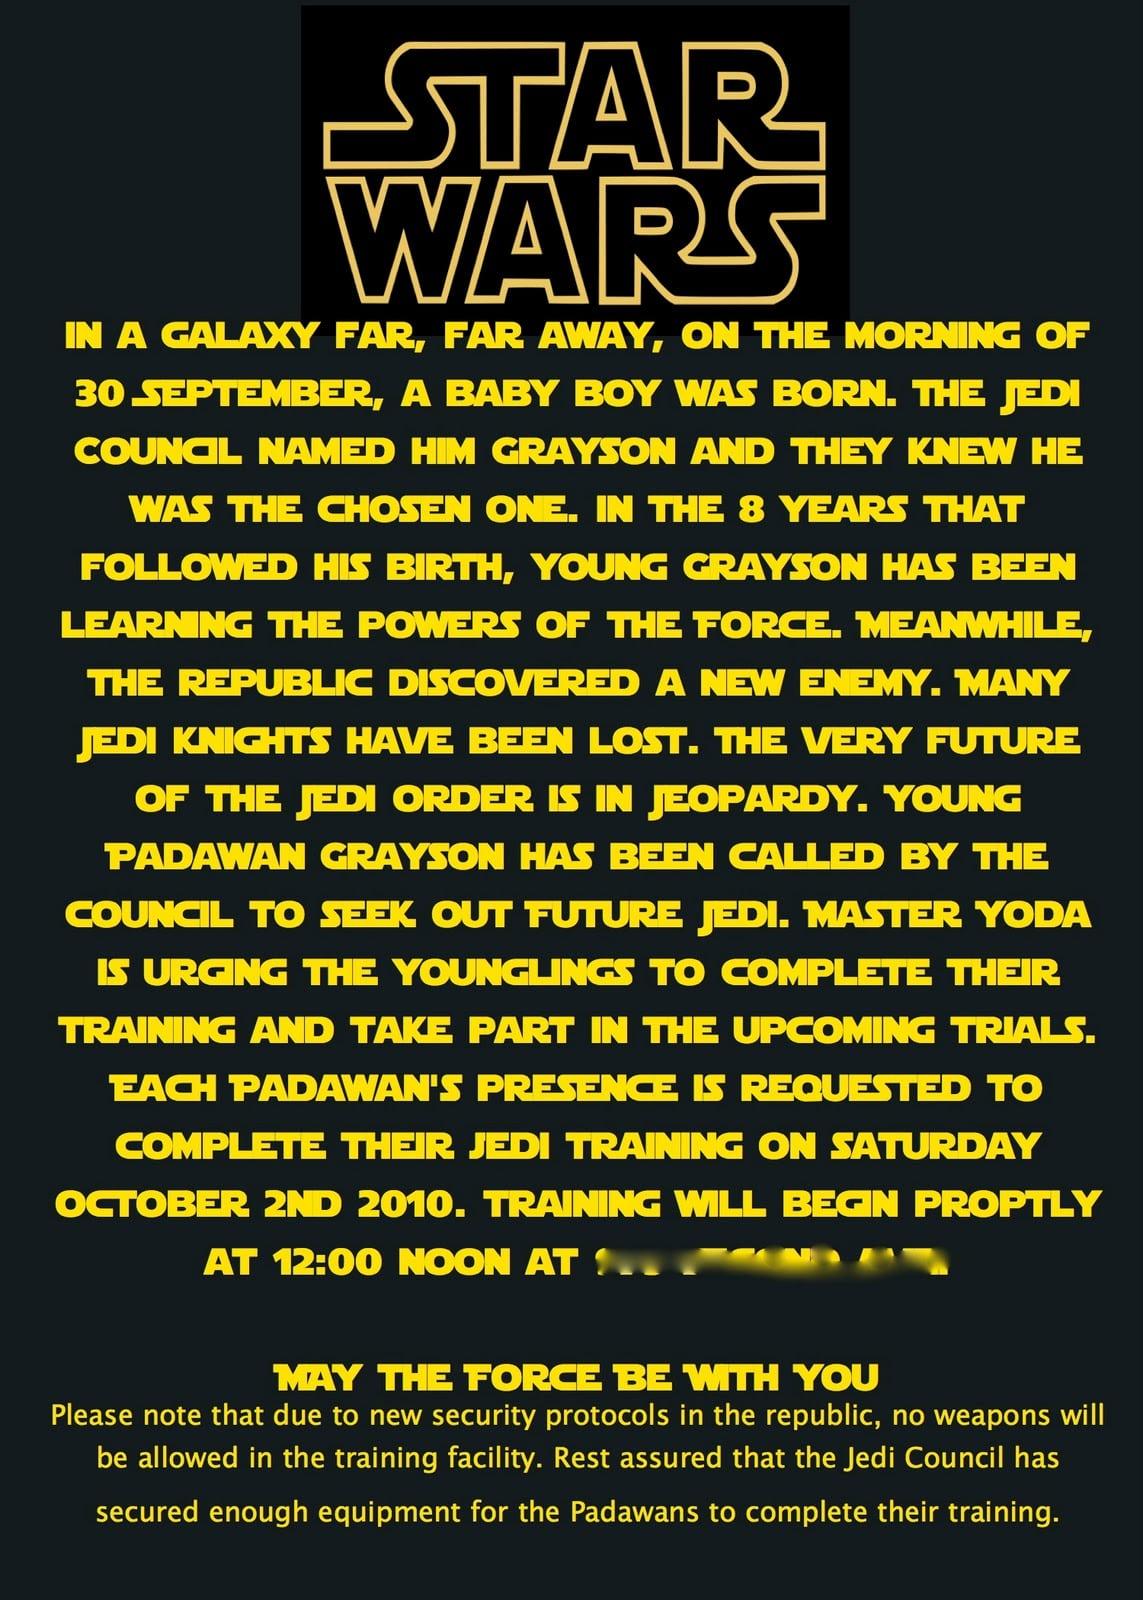 Lego Star Wars Invitation Template